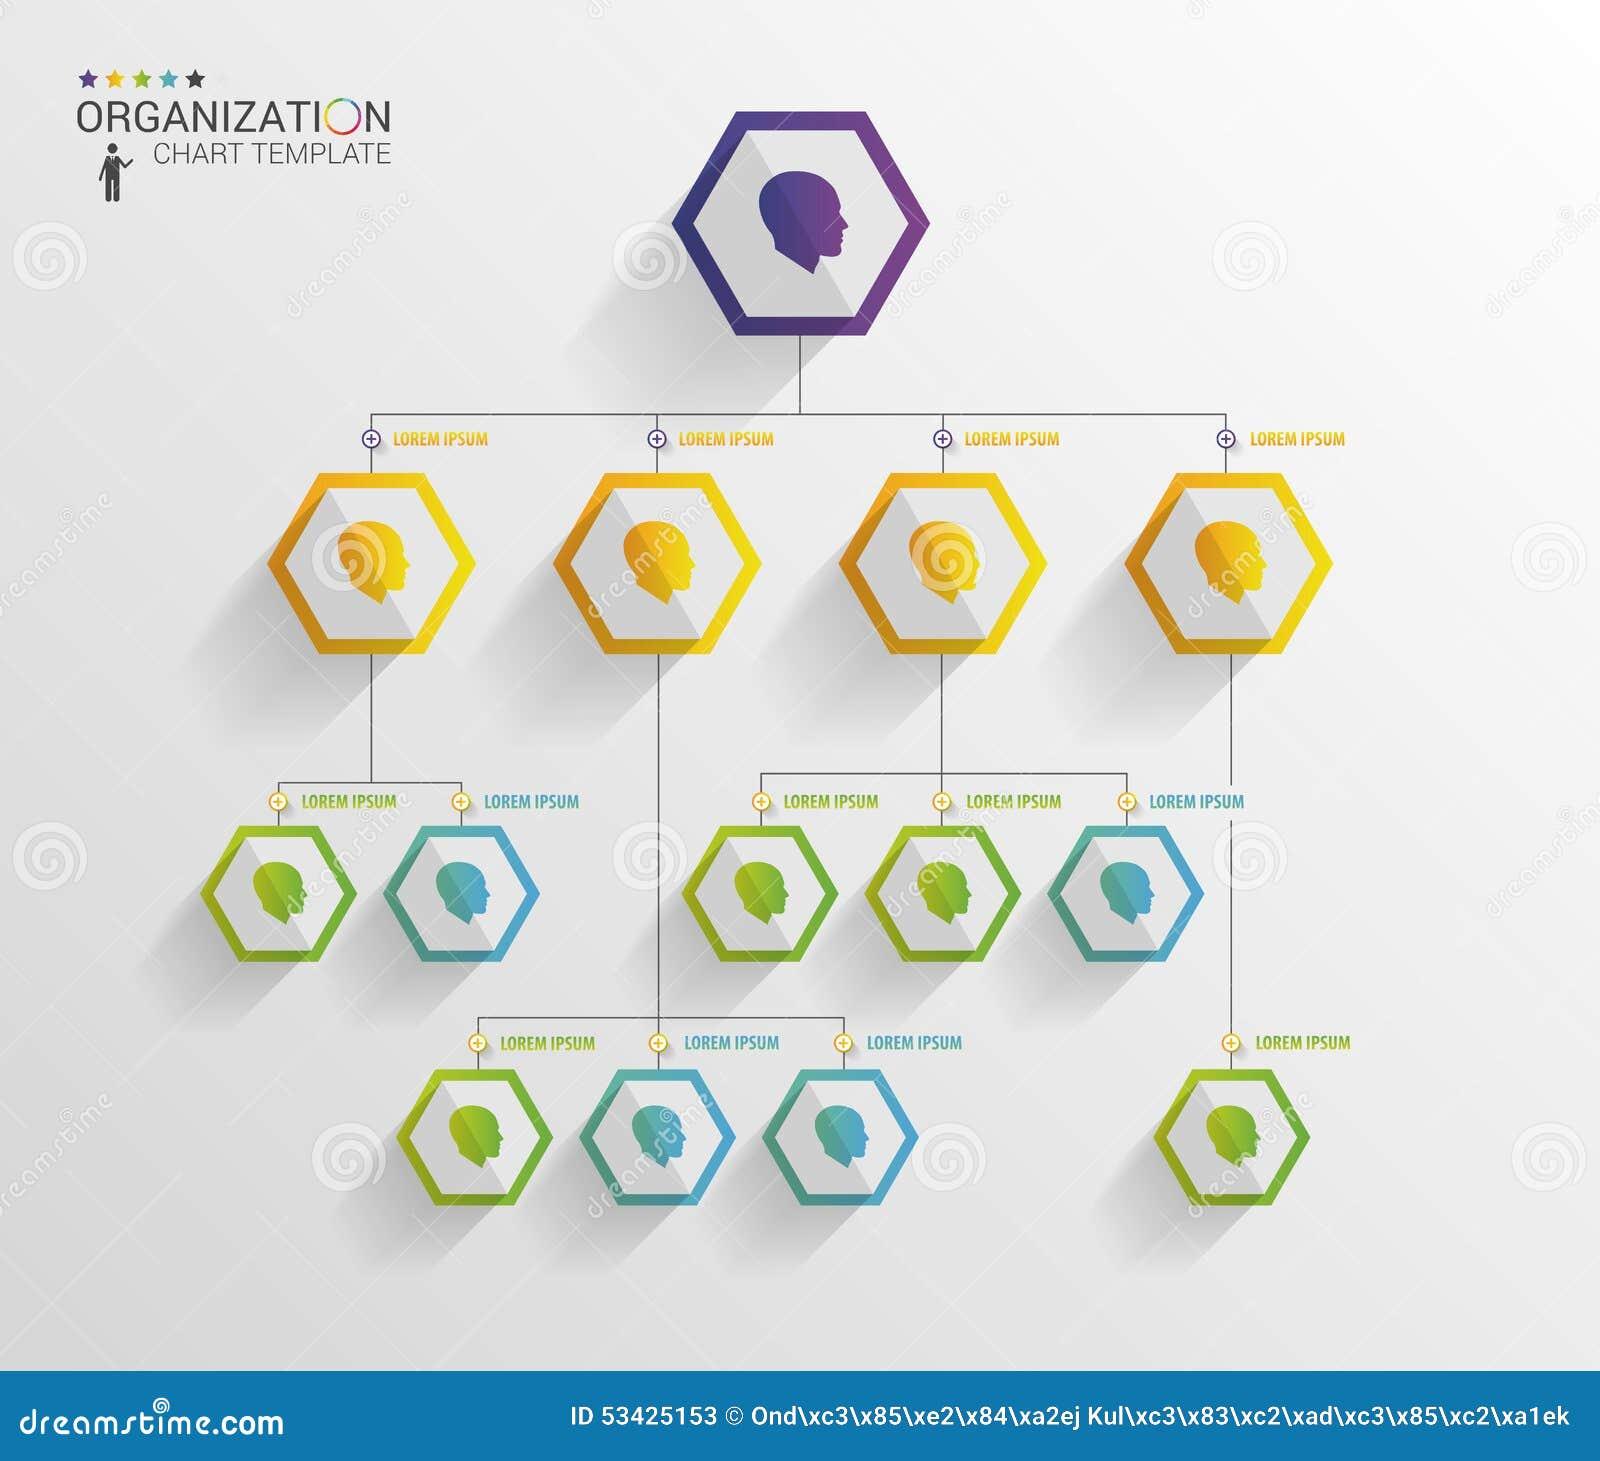 modern organization chart template vector stock vector illustration 53425153. Black Bedroom Furniture Sets. Home Design Ideas